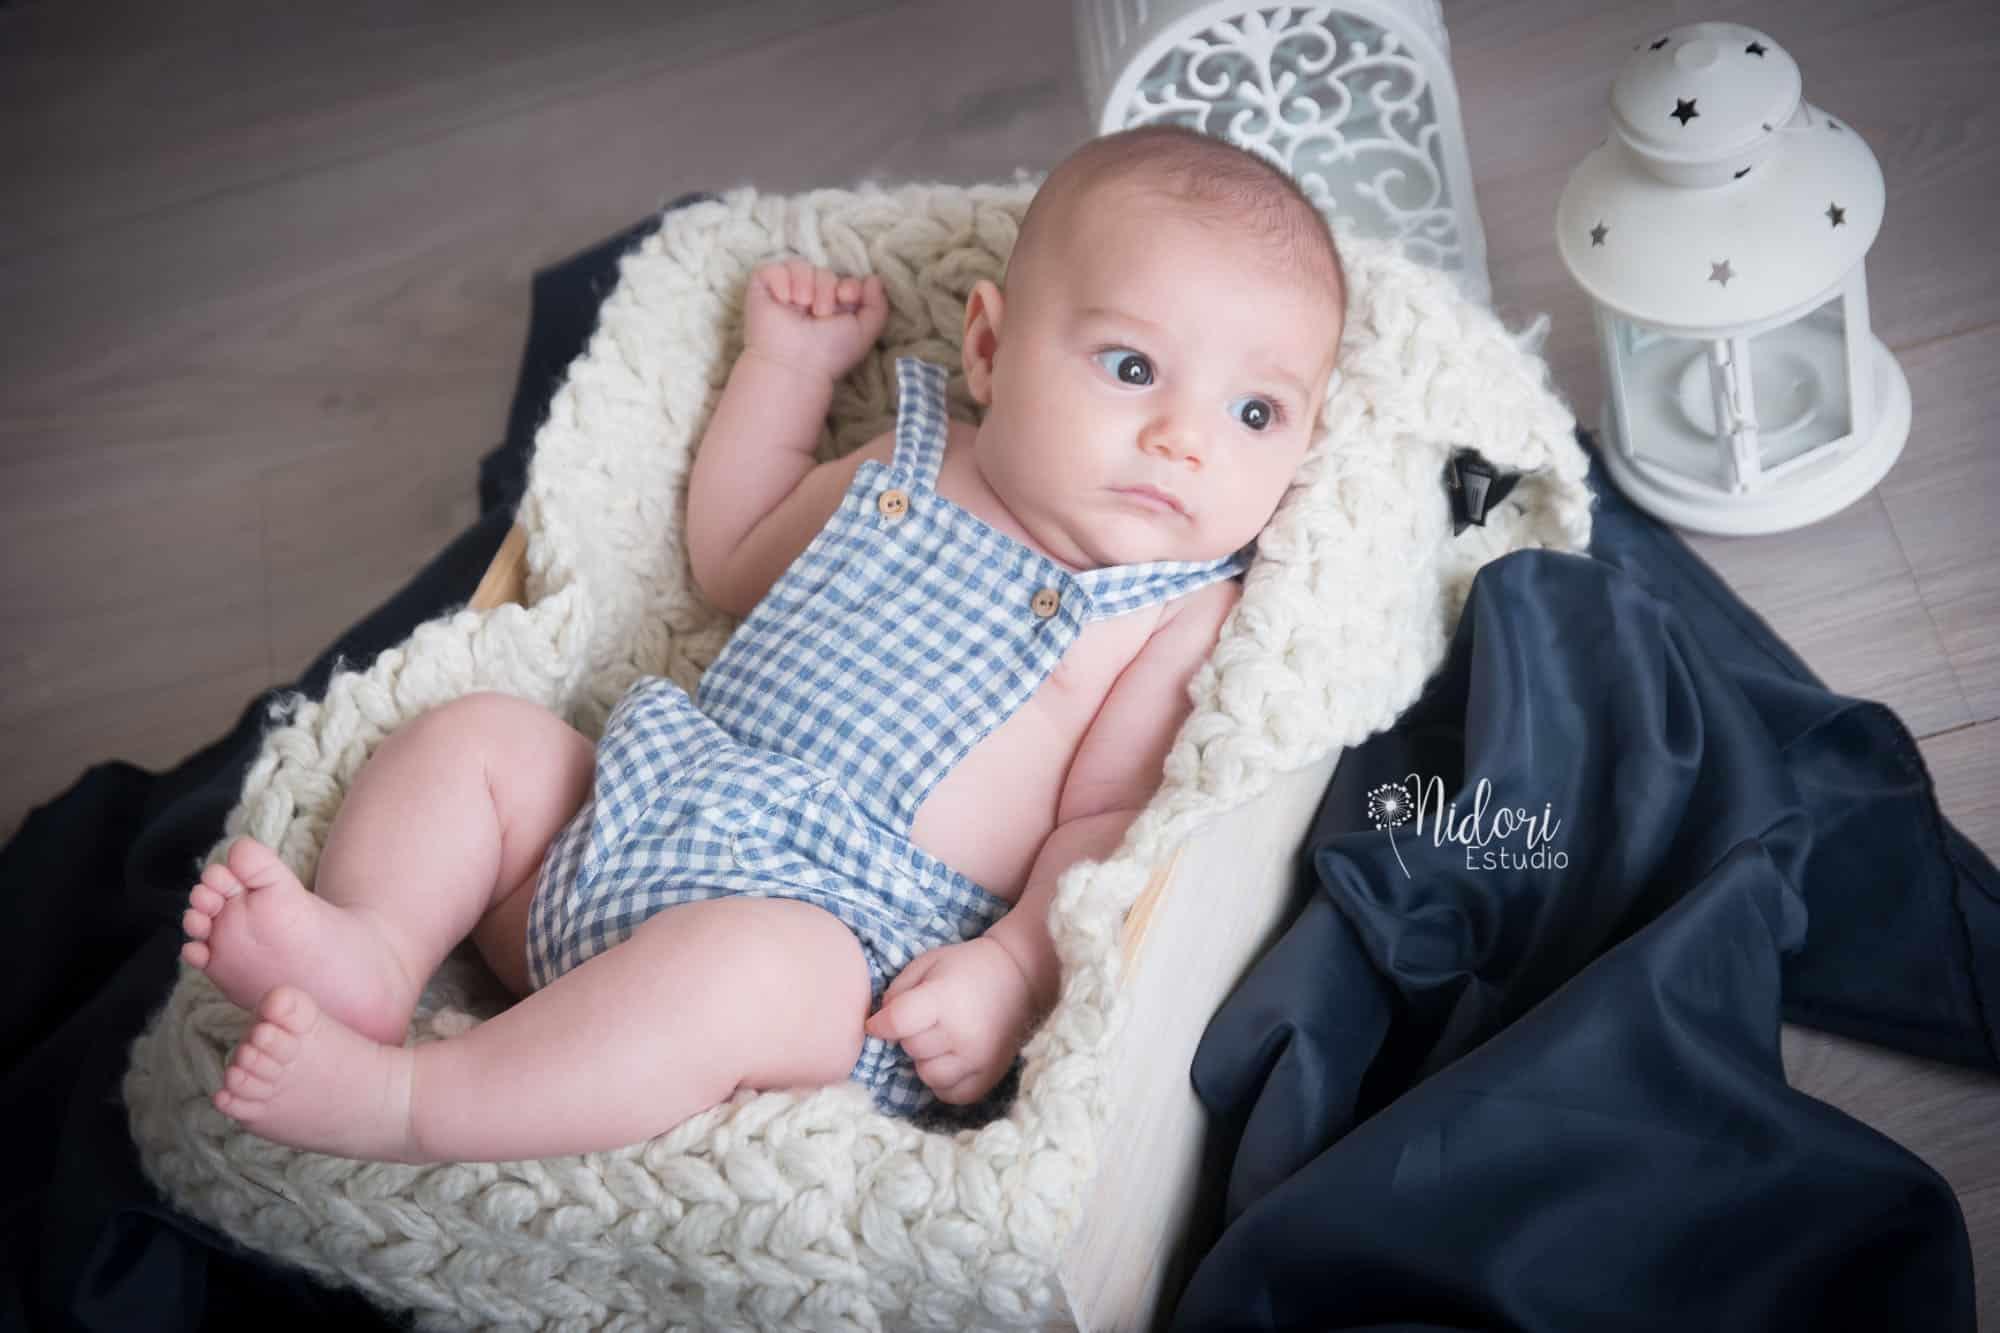 seguimiento-fotografia-niños-bebes-nidoriestudio-fotos-valencia-almazora-castellon-españa-spain-24